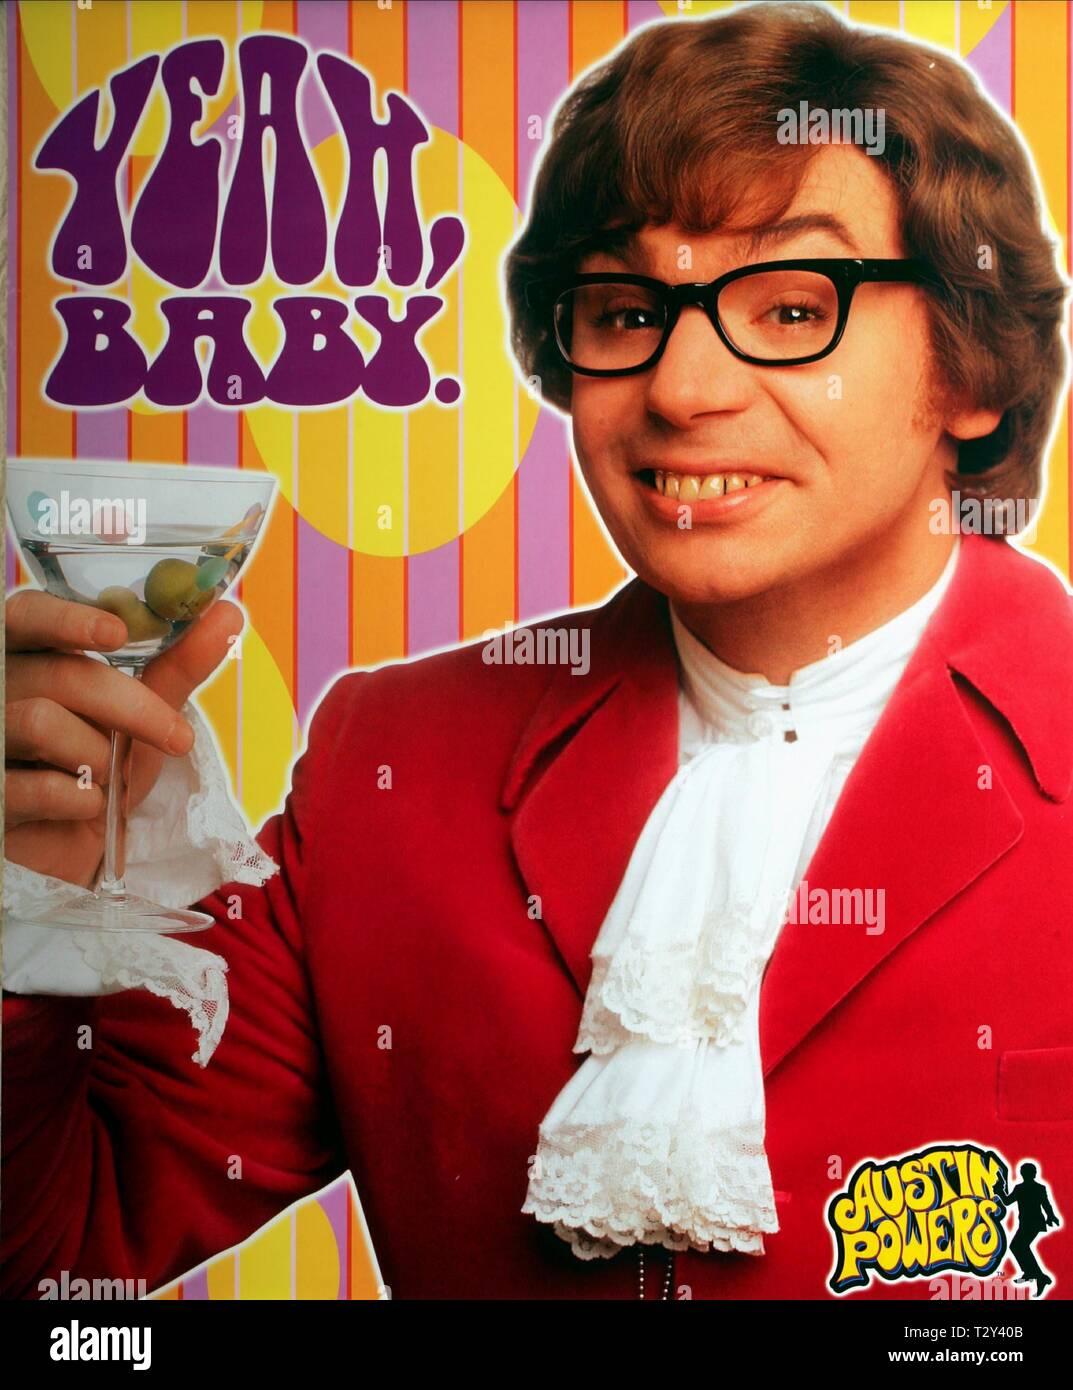 https www alamy com mike myers poster austin powers international man of mystery 1997 image242770315 html